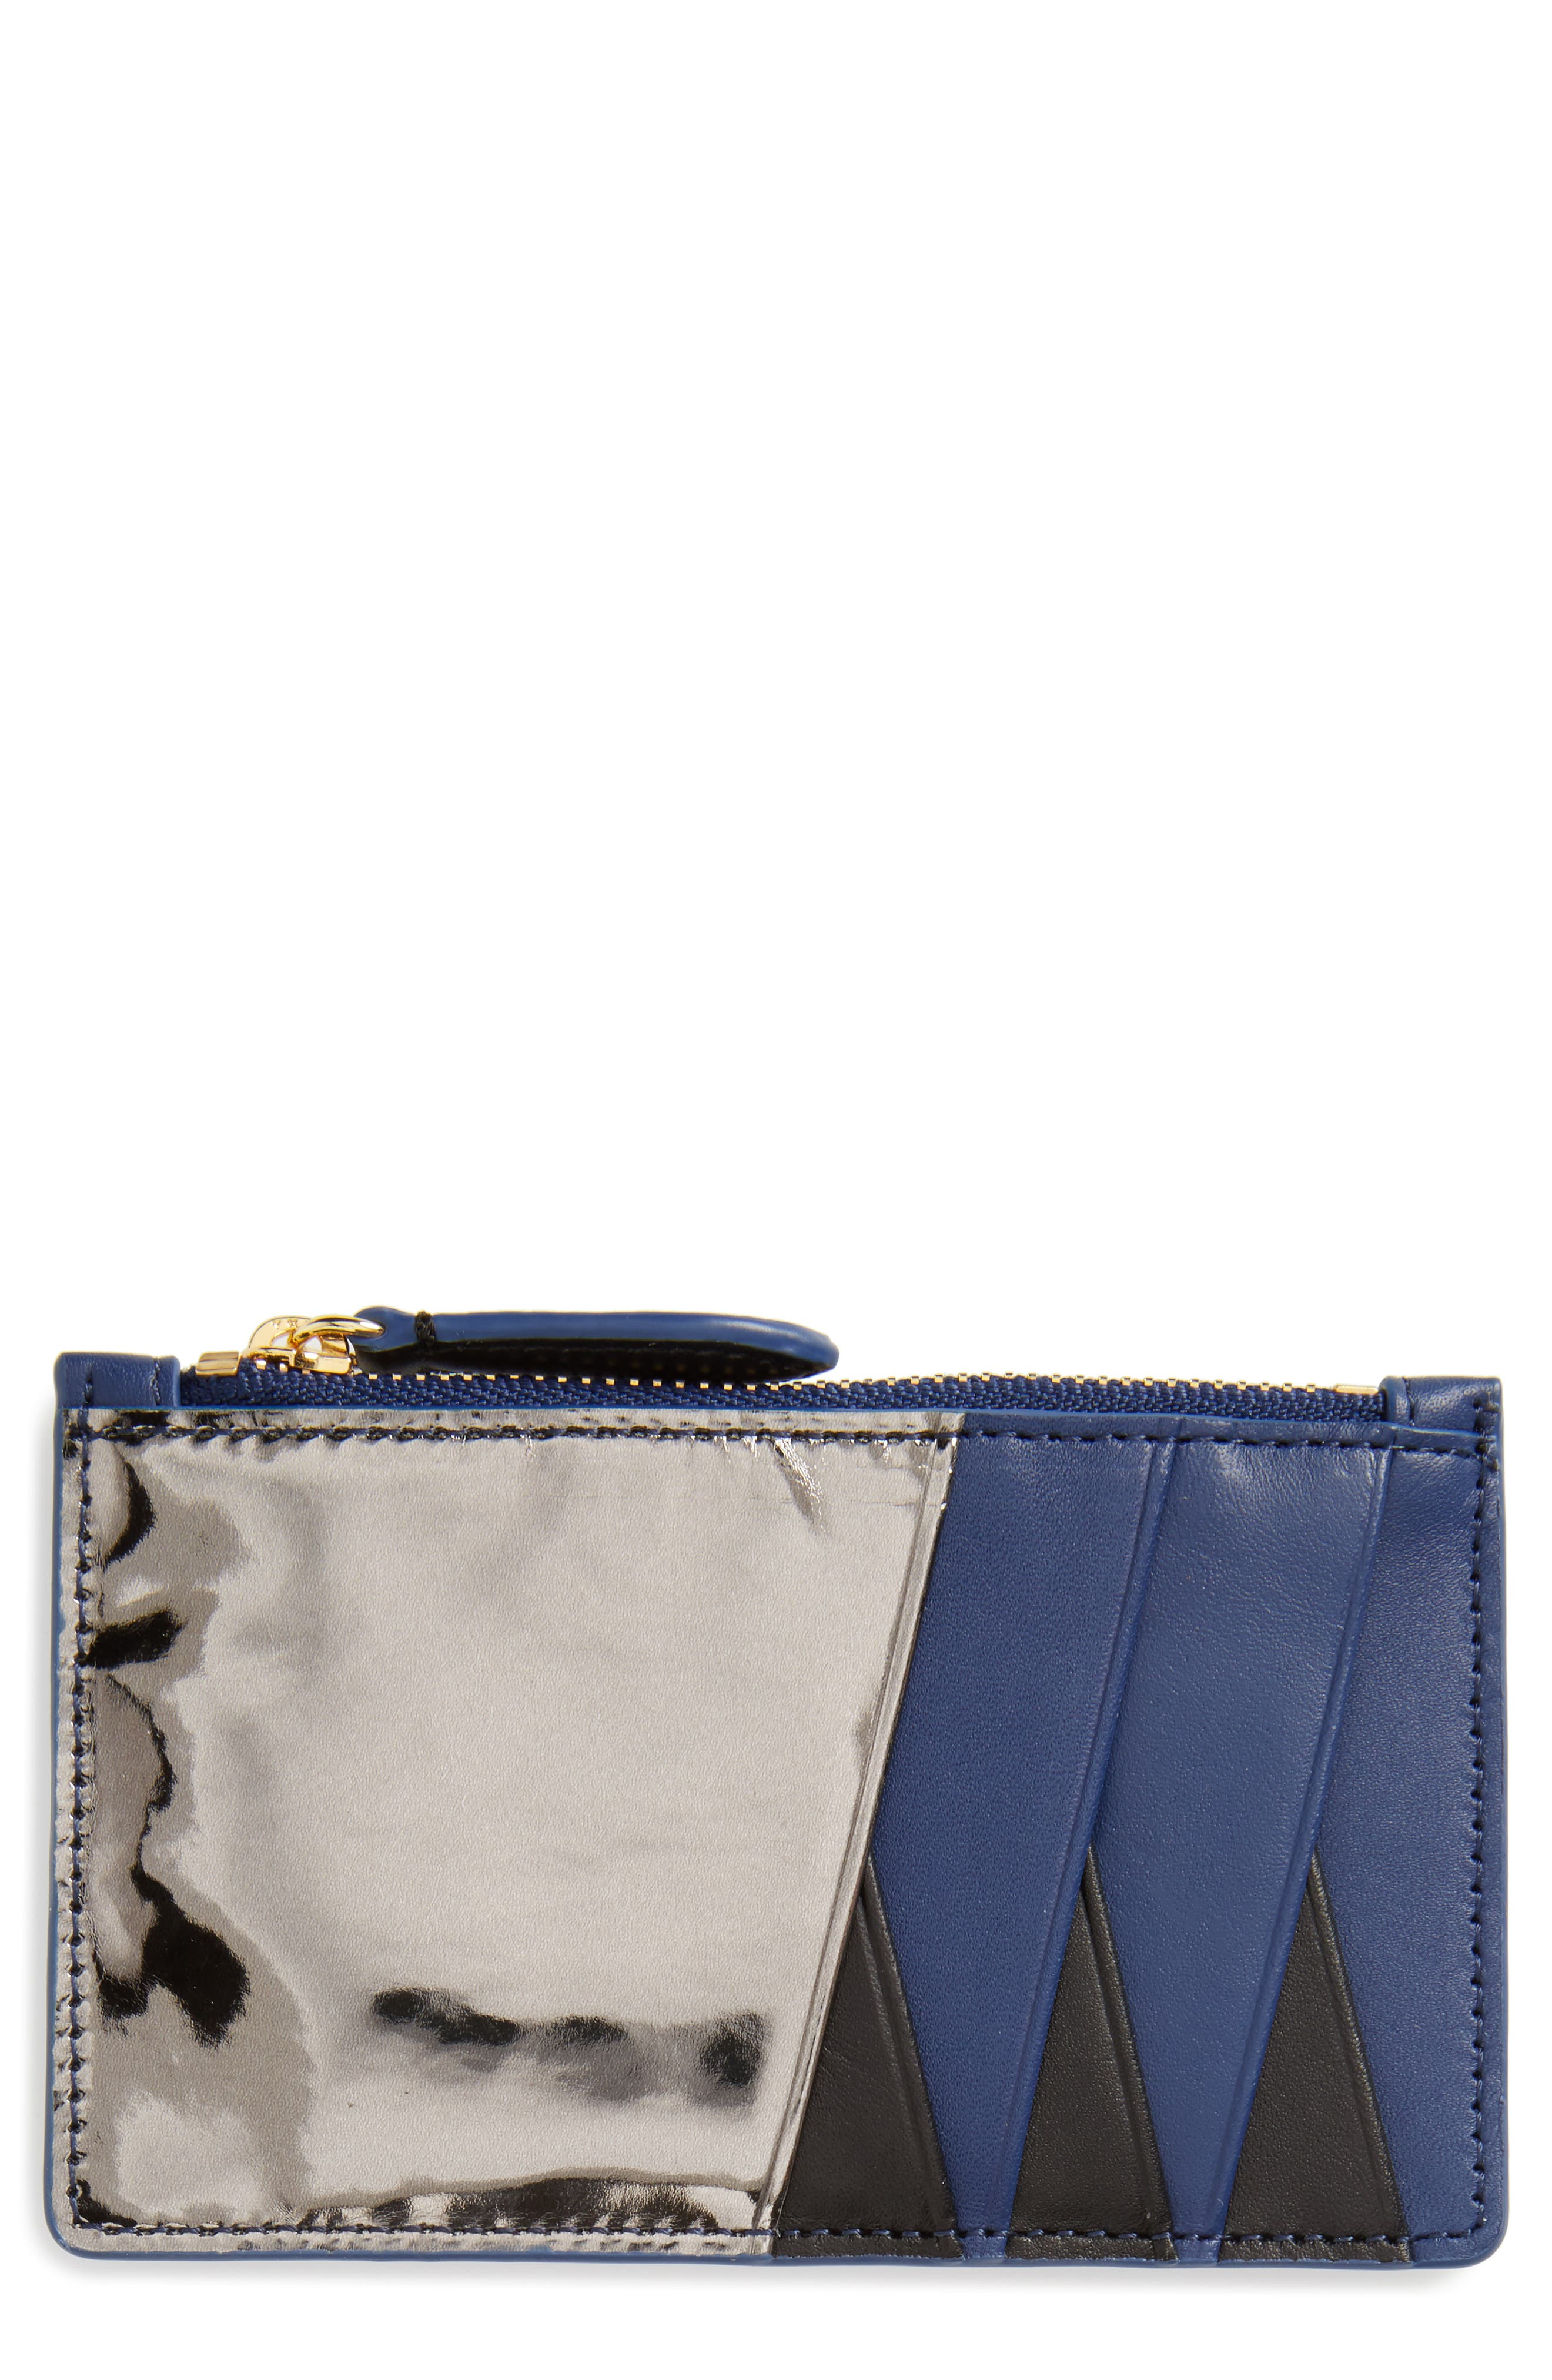 Alternate Image 1 Selected - Diane von Furstenberg Leather Card Case